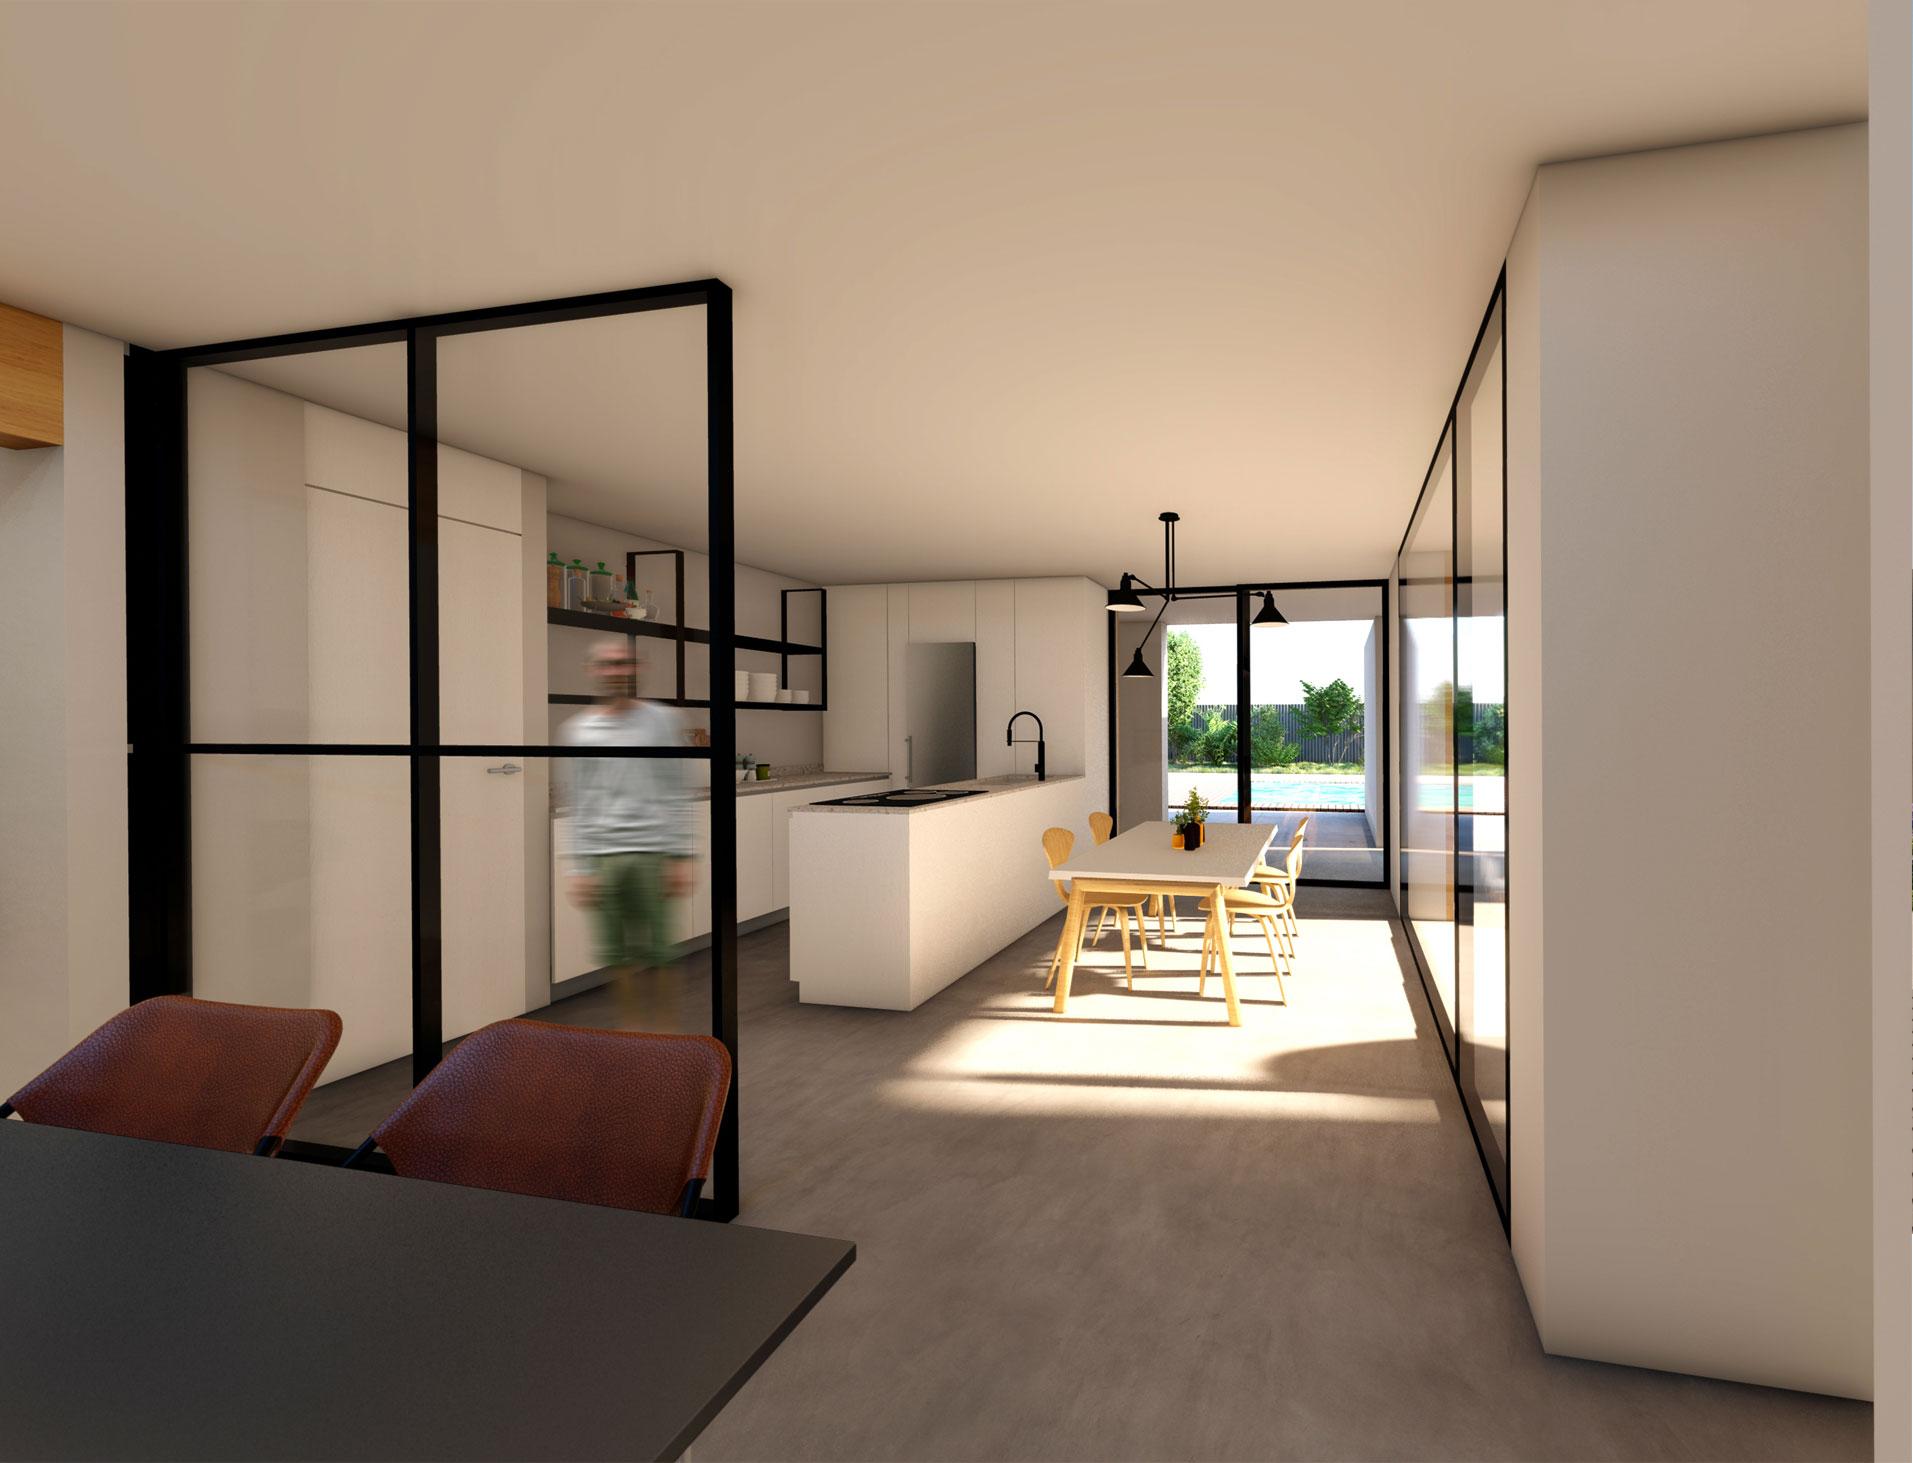 vivienda-modular-barcelona-3